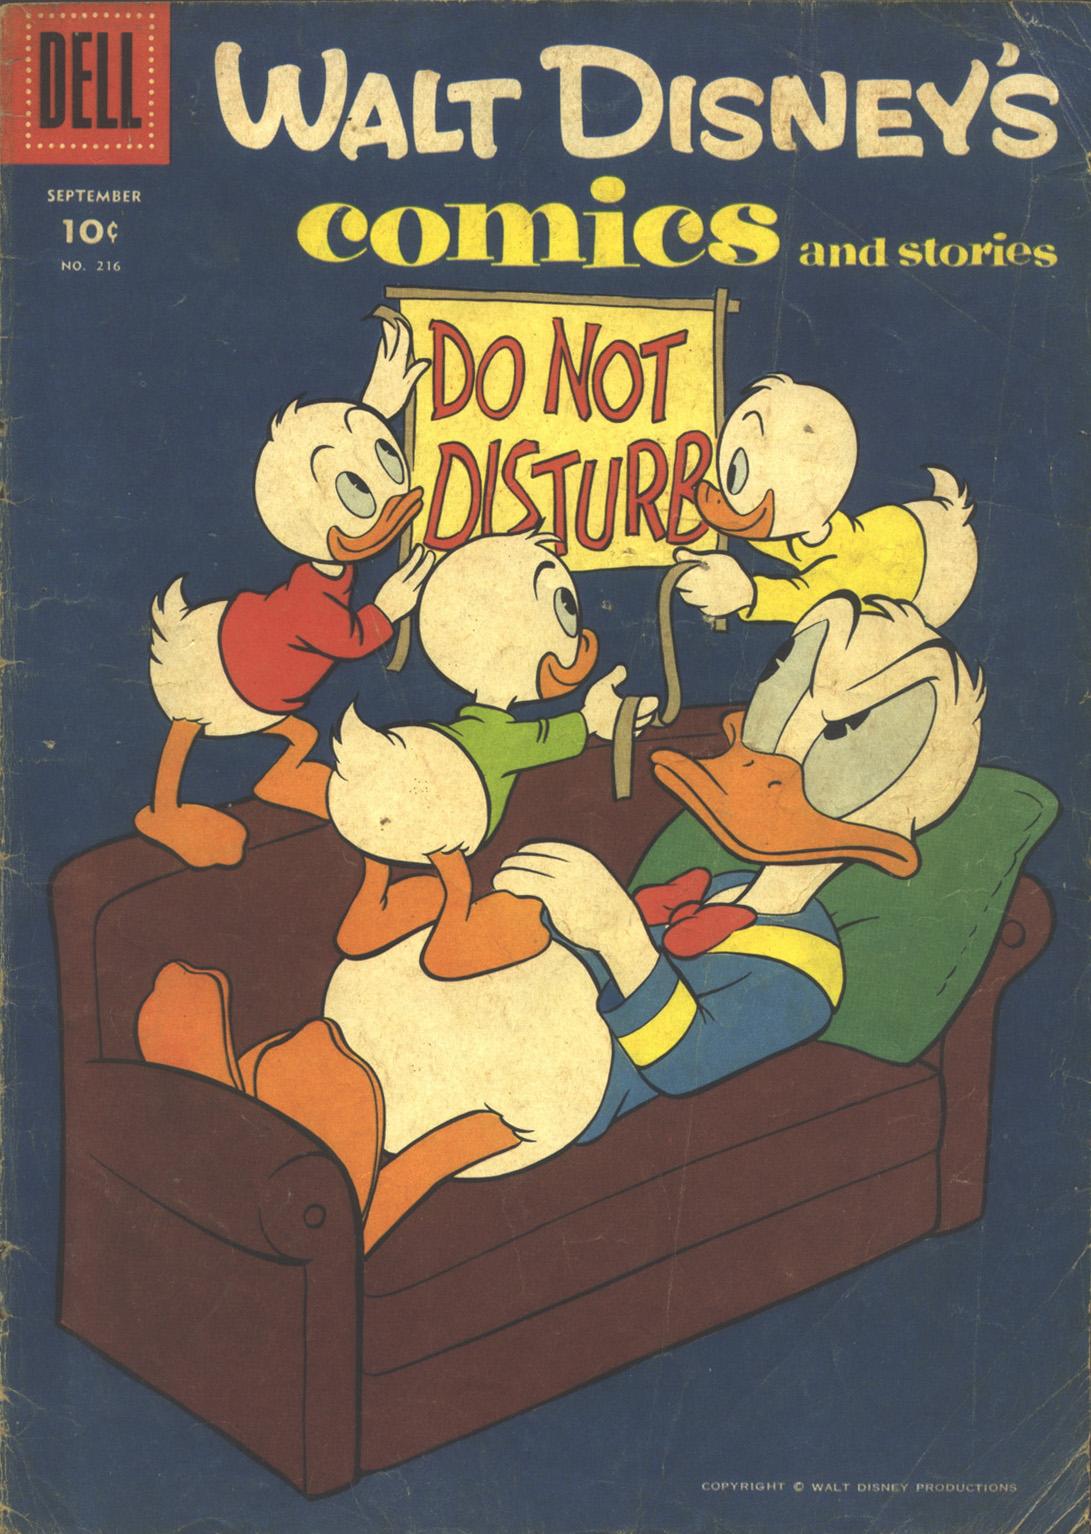 Walt Disneys Comics and Stories 216 Page 1